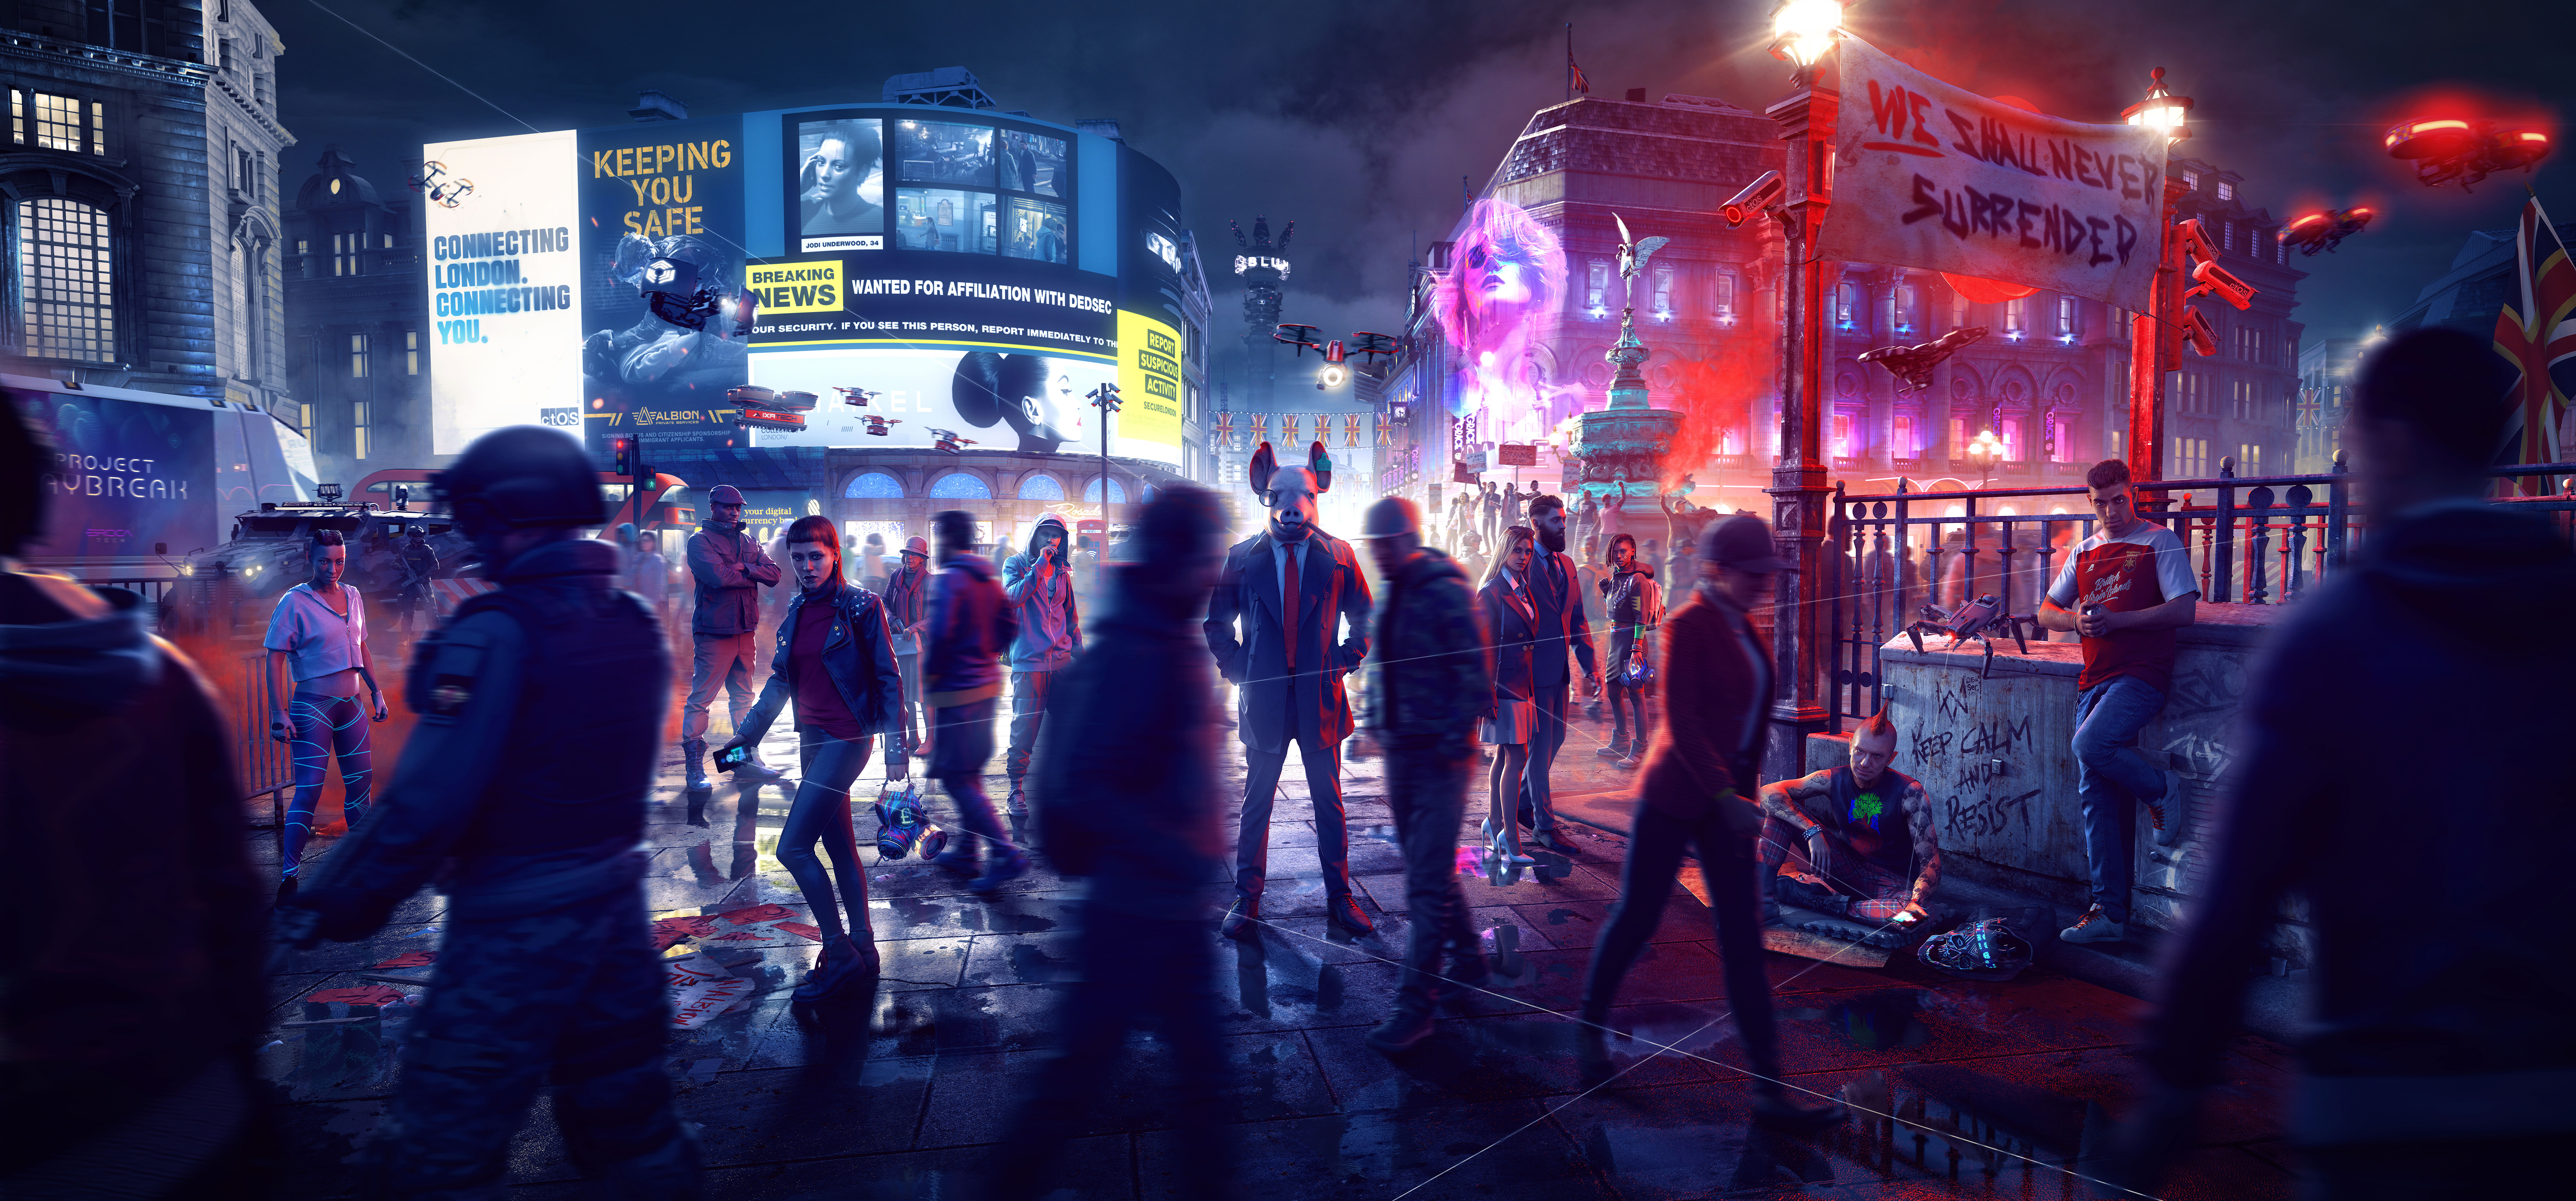 Watch Dogs: Legion 4K Wallpaper, 2020 Games, PlayStation 5 ...